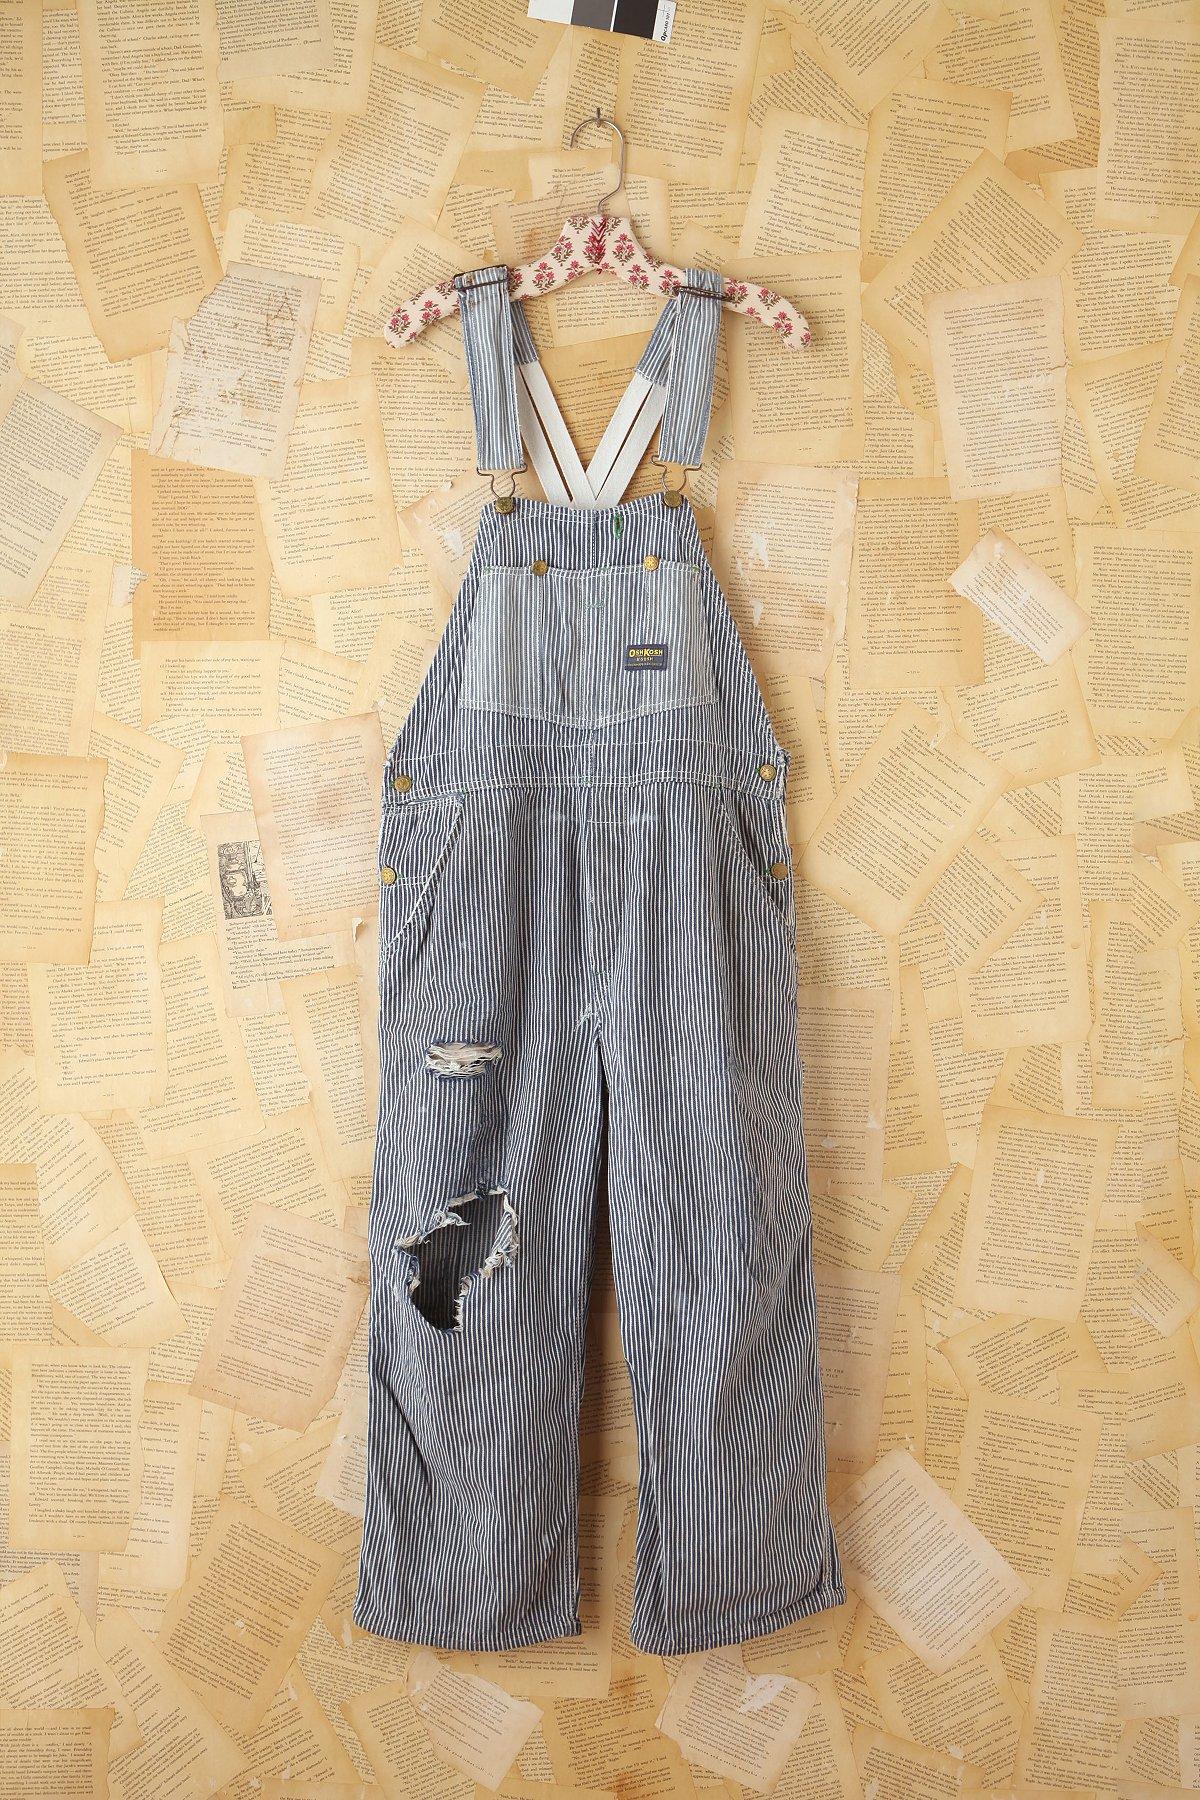 Vintage Osh Kosh Striped Denim Overall